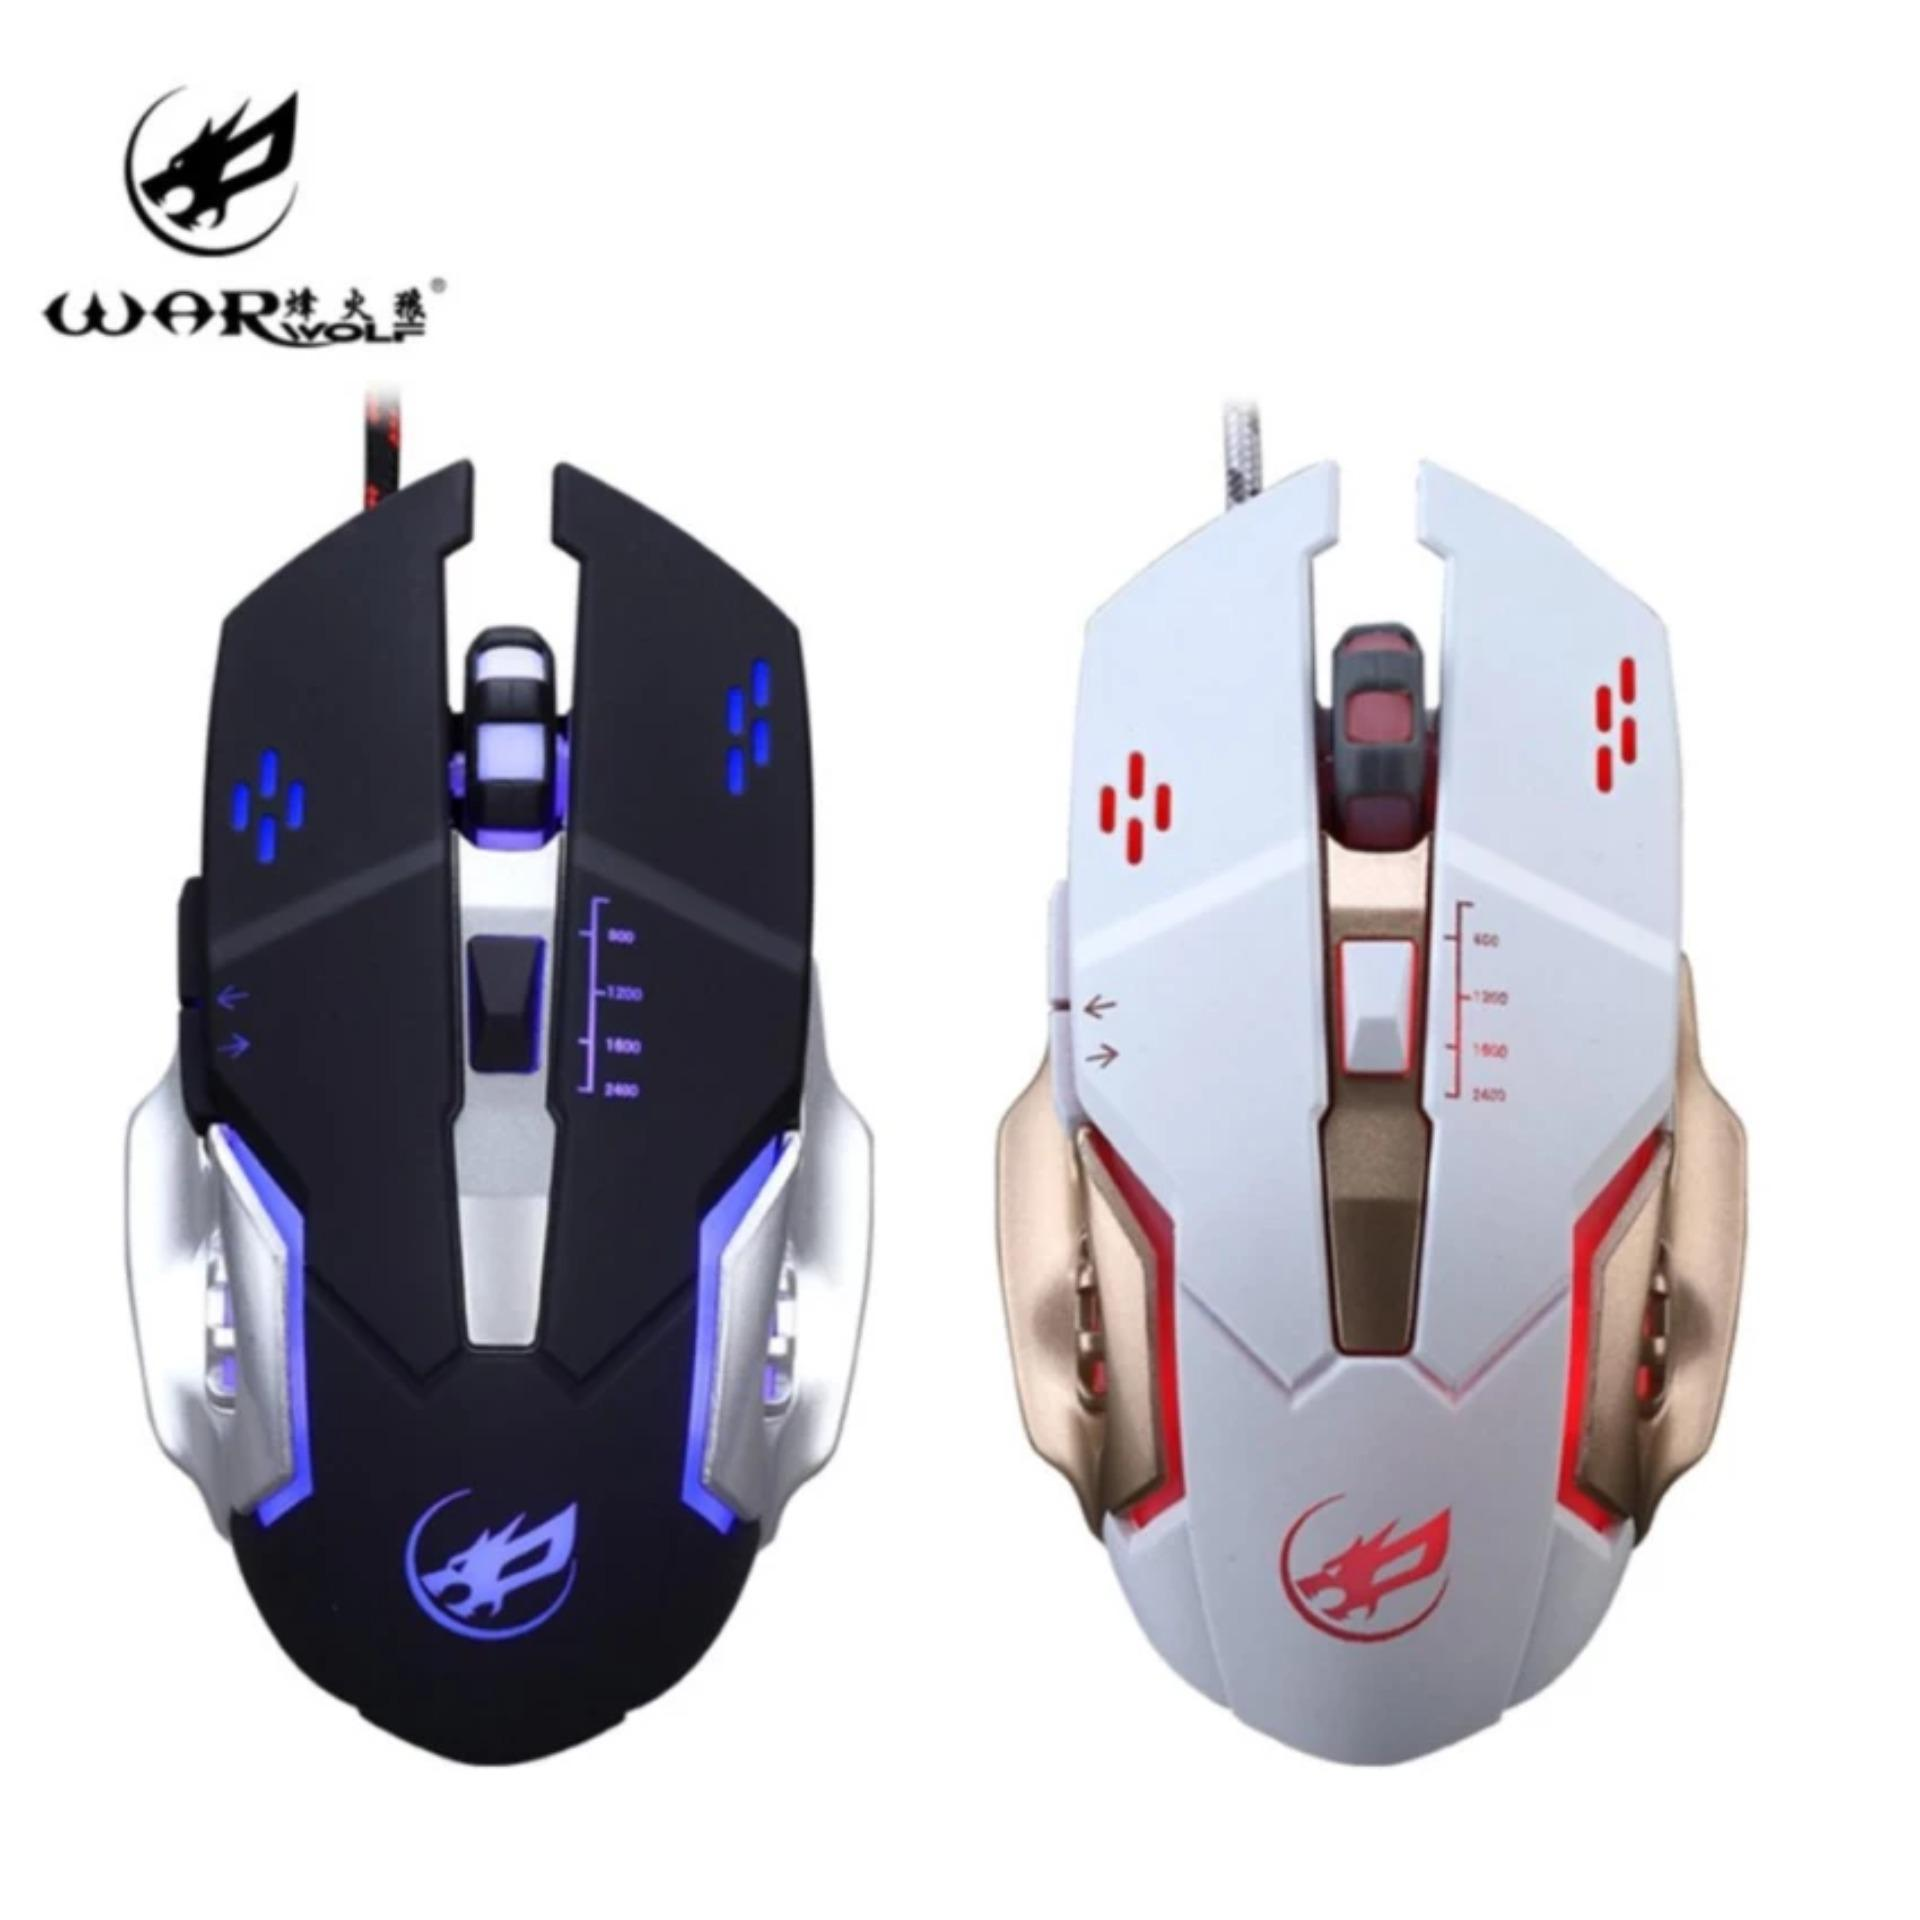 Mousepad Gaming Mouse Pad Alas Motif Dota 2 Size Medium Steel Series Lebar 45 X 35cm